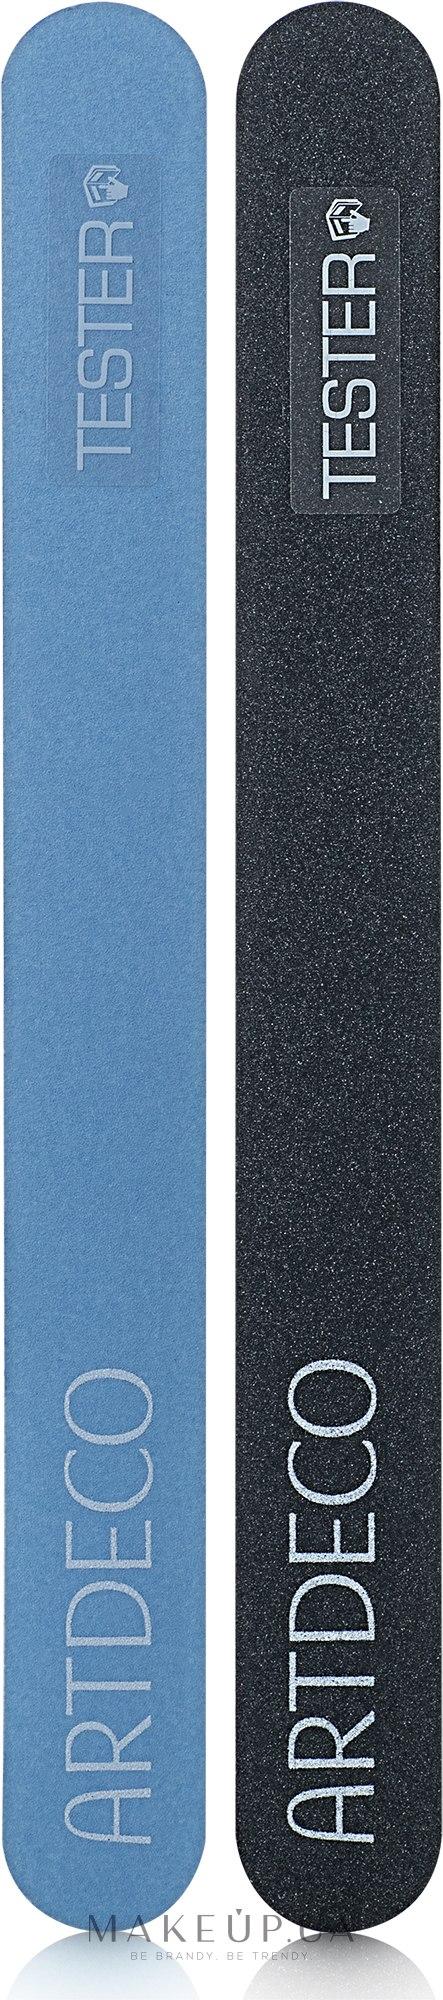 Пилочка для ногтей - Artdeco Professional Files (тестер) — фото 2шт